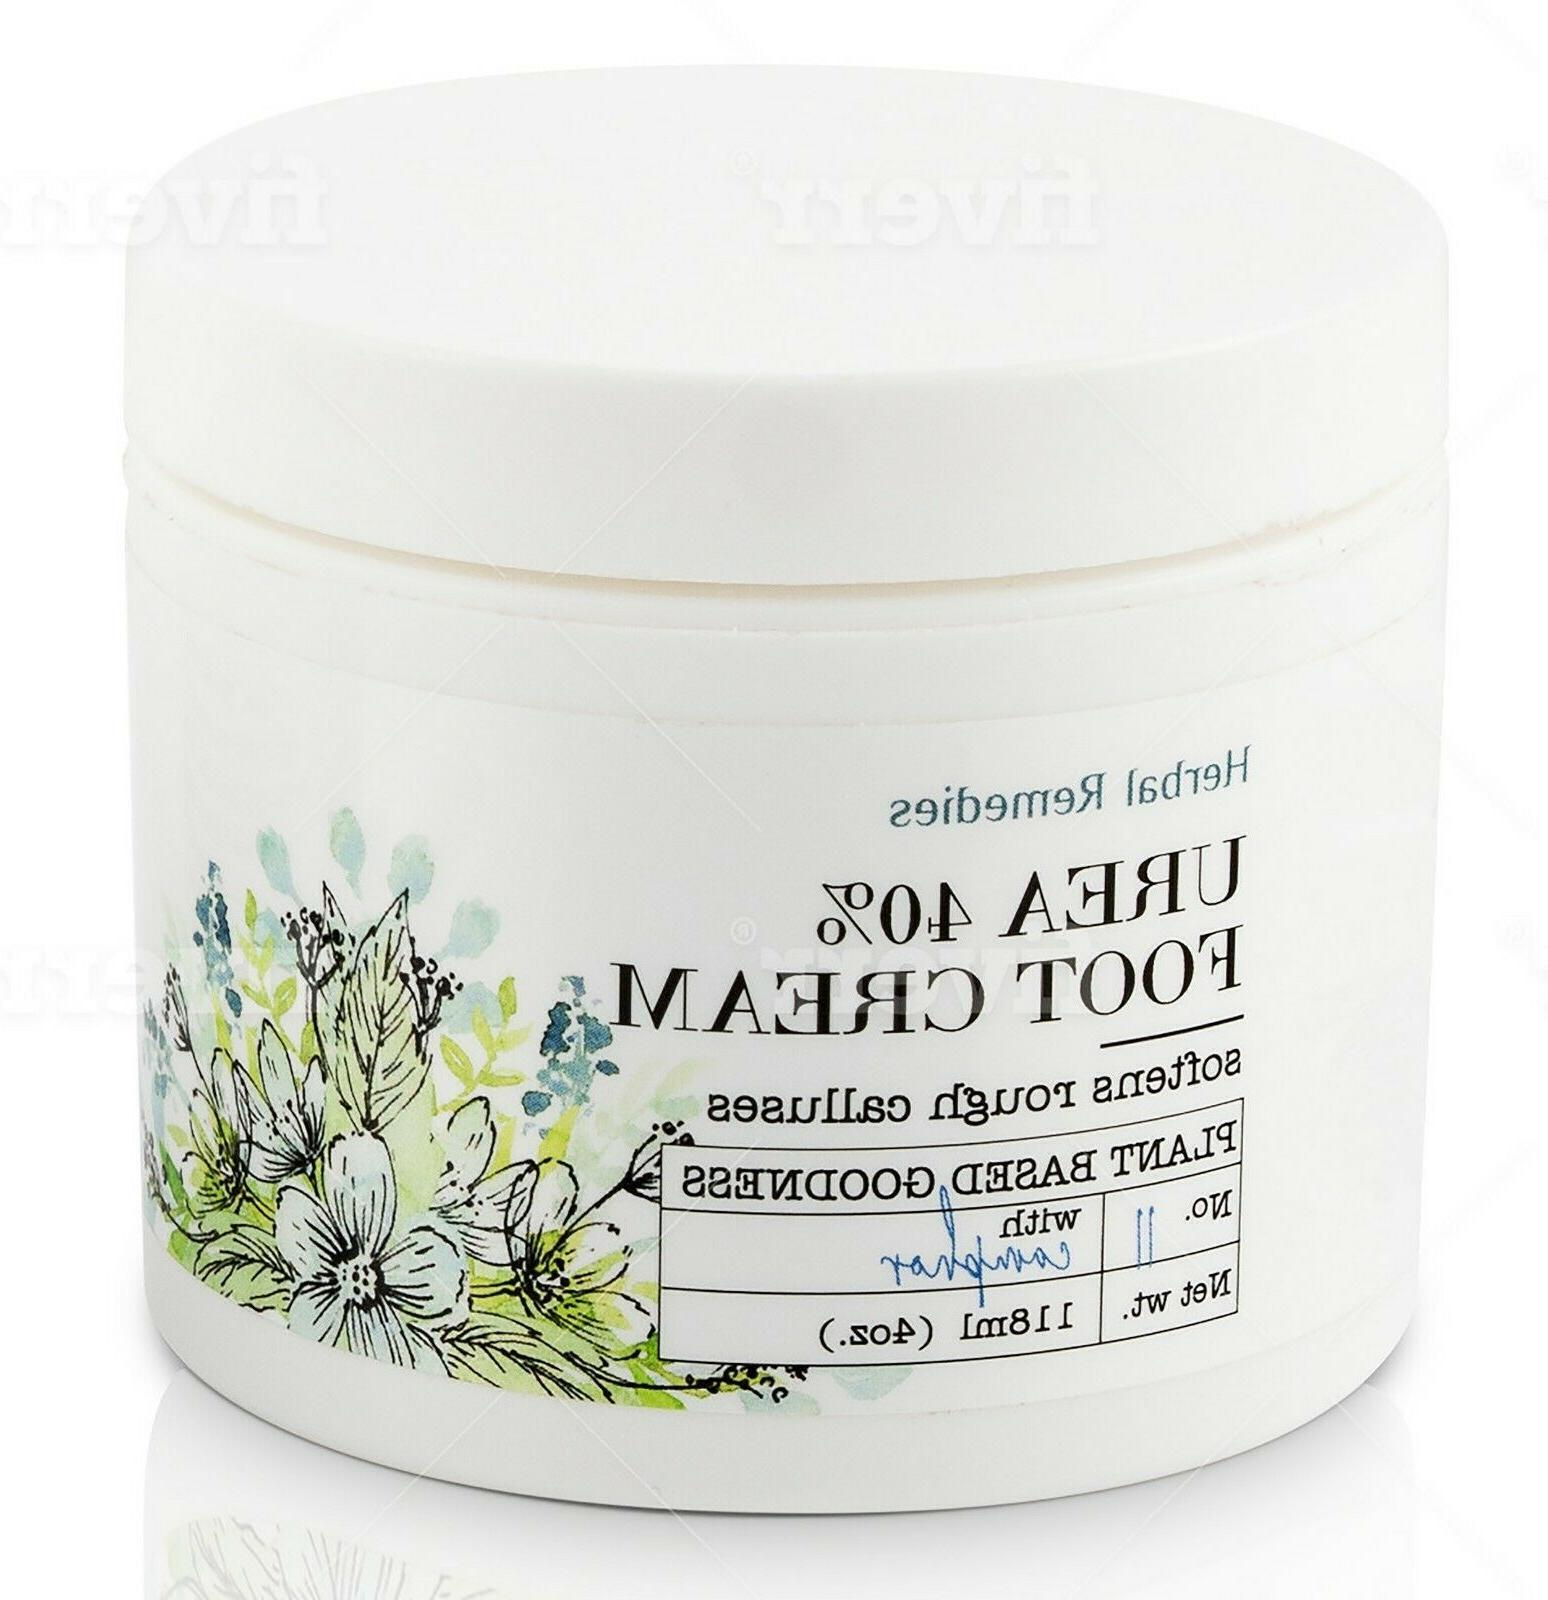 urea 40 percent foot cream humectant moisturizer